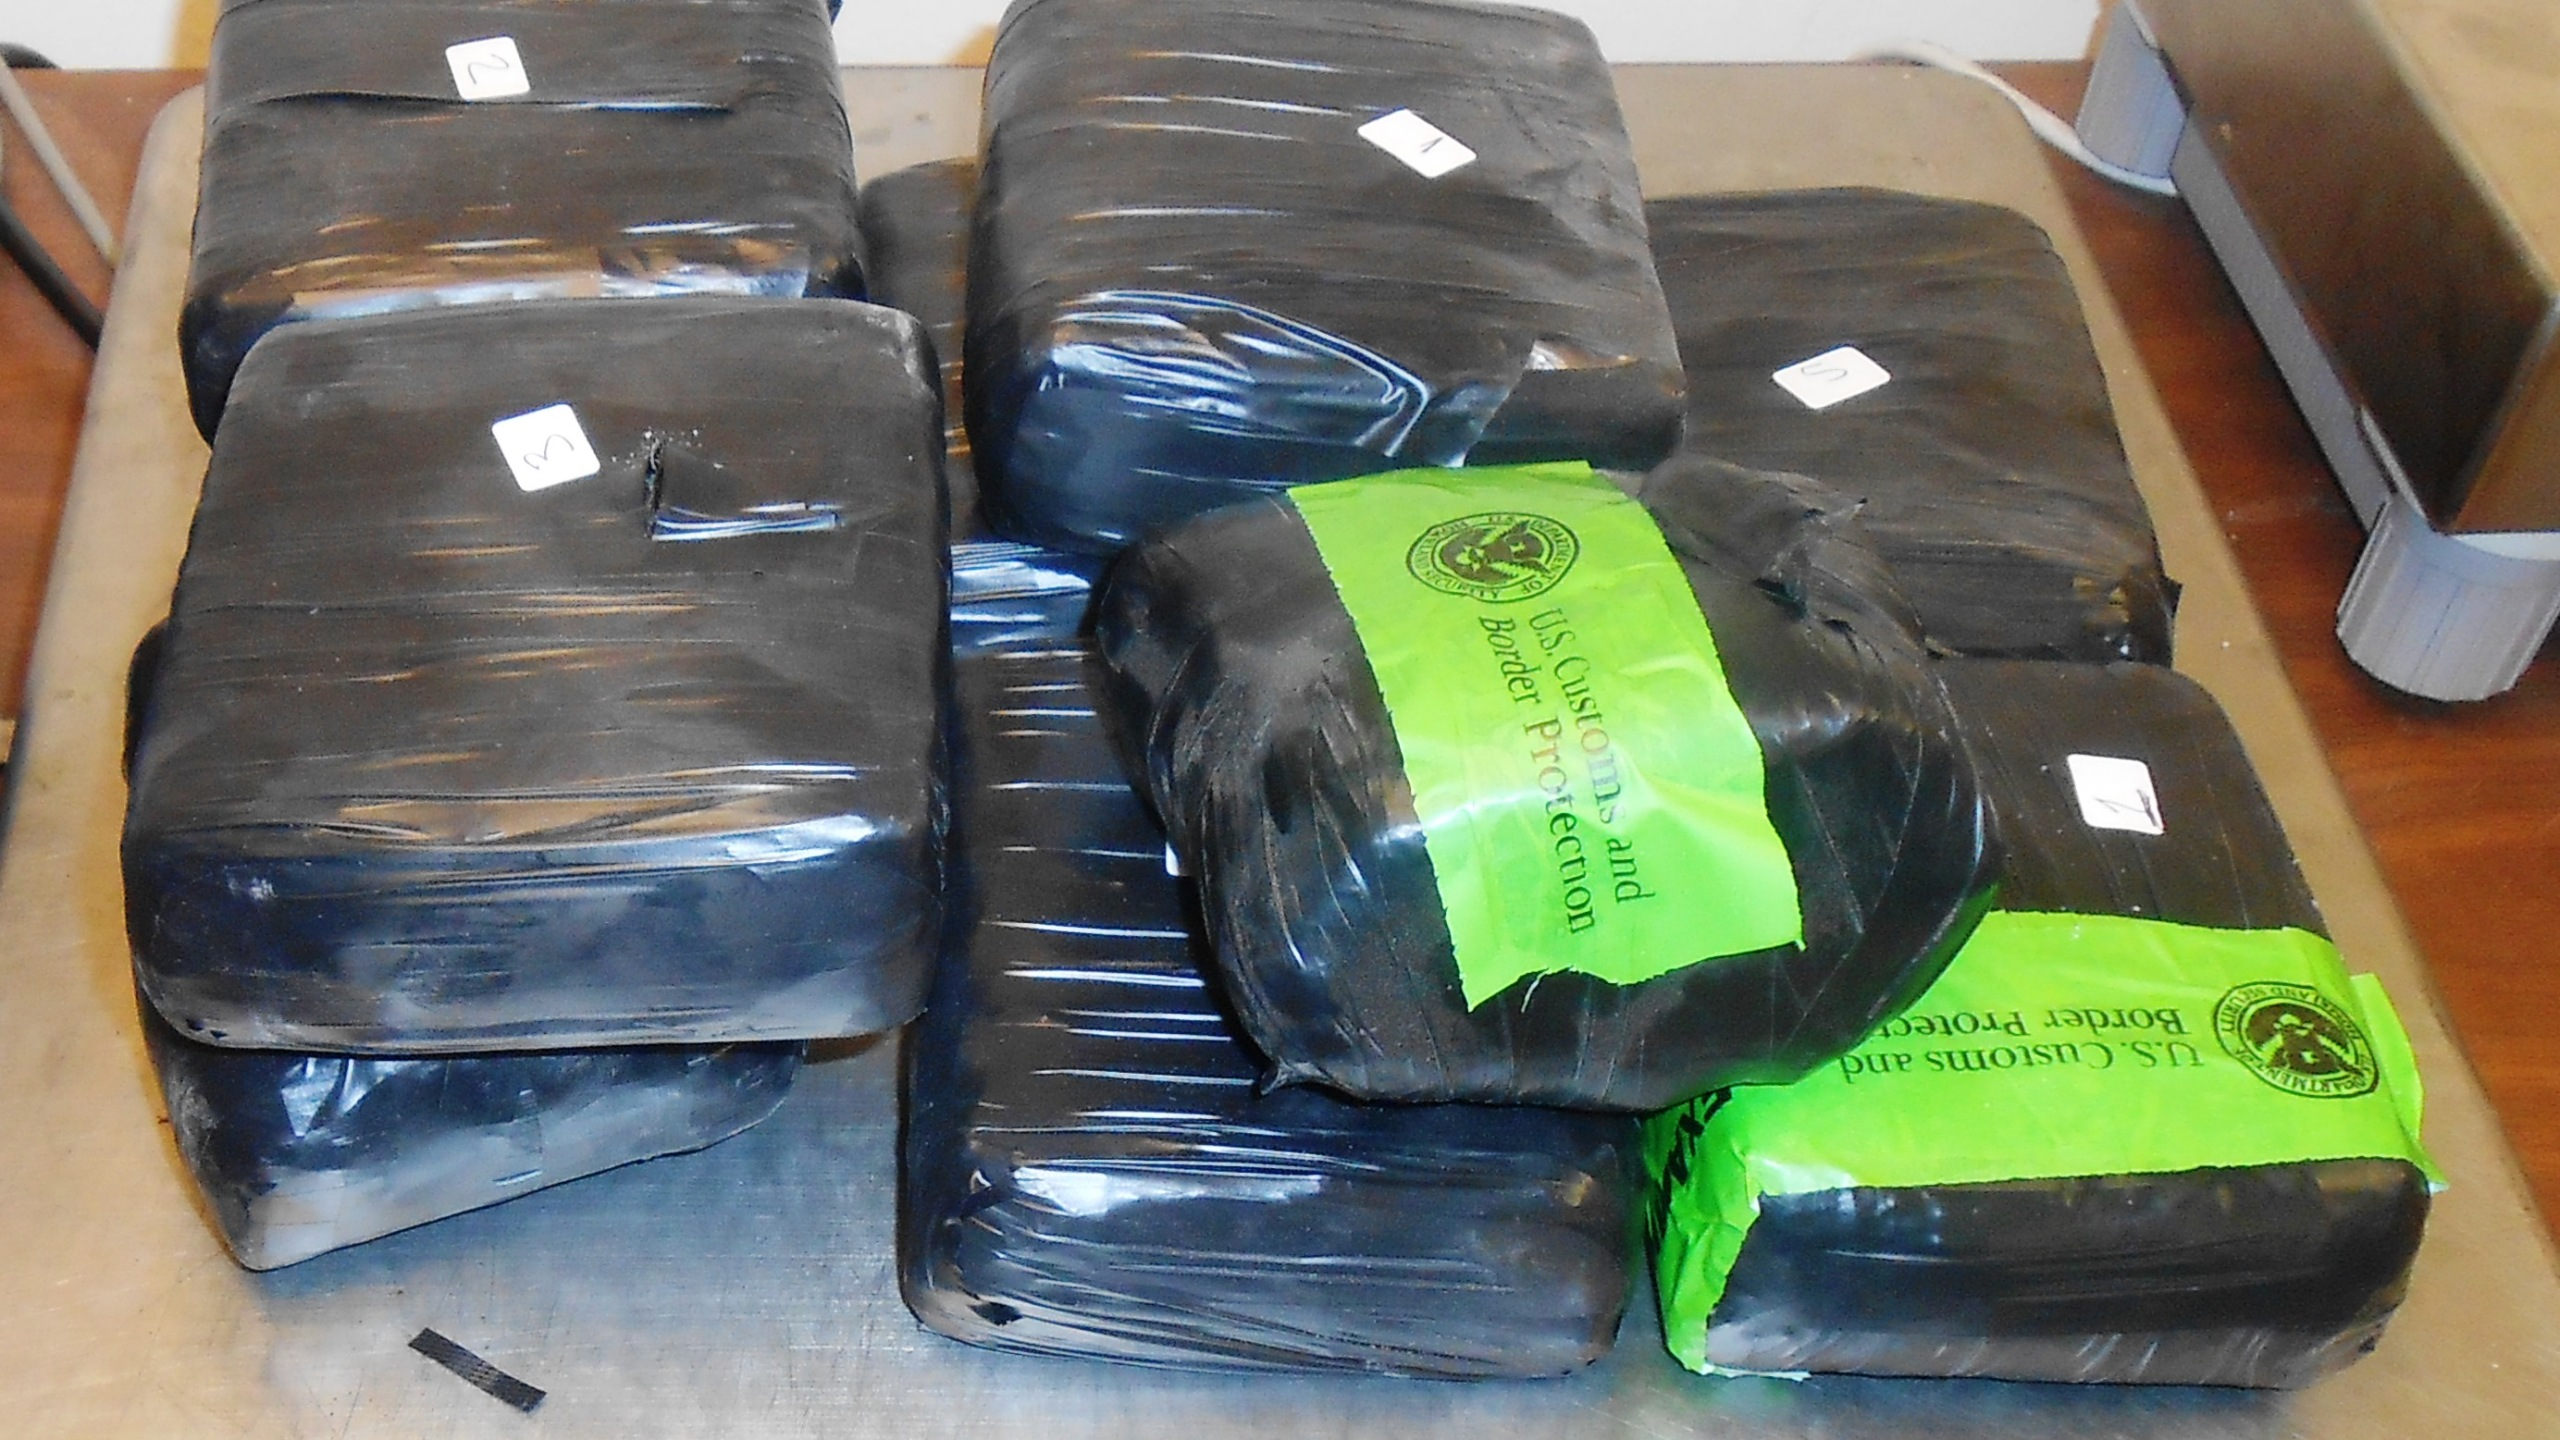 09052016 Hidalgo Cocaine Seizure, Courtesy CBP Hidalgo_1473255779315.JPG